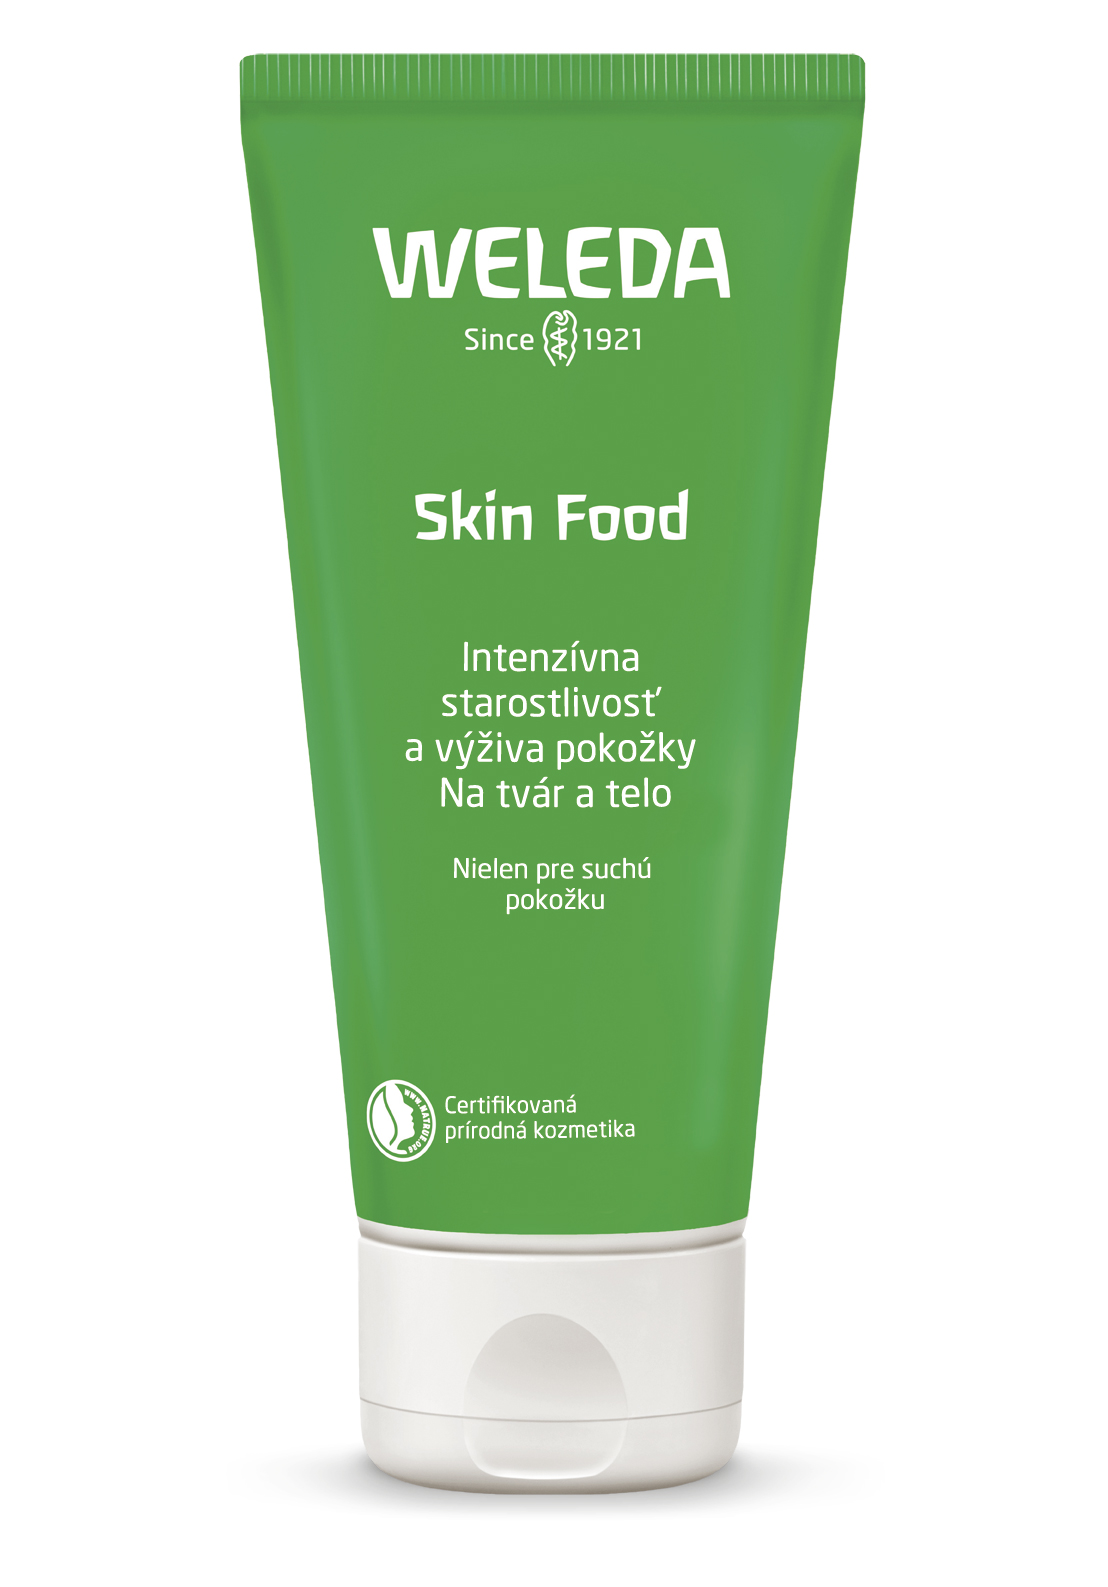 Skin Food Gyógynövényes arckrém 75 ml-1